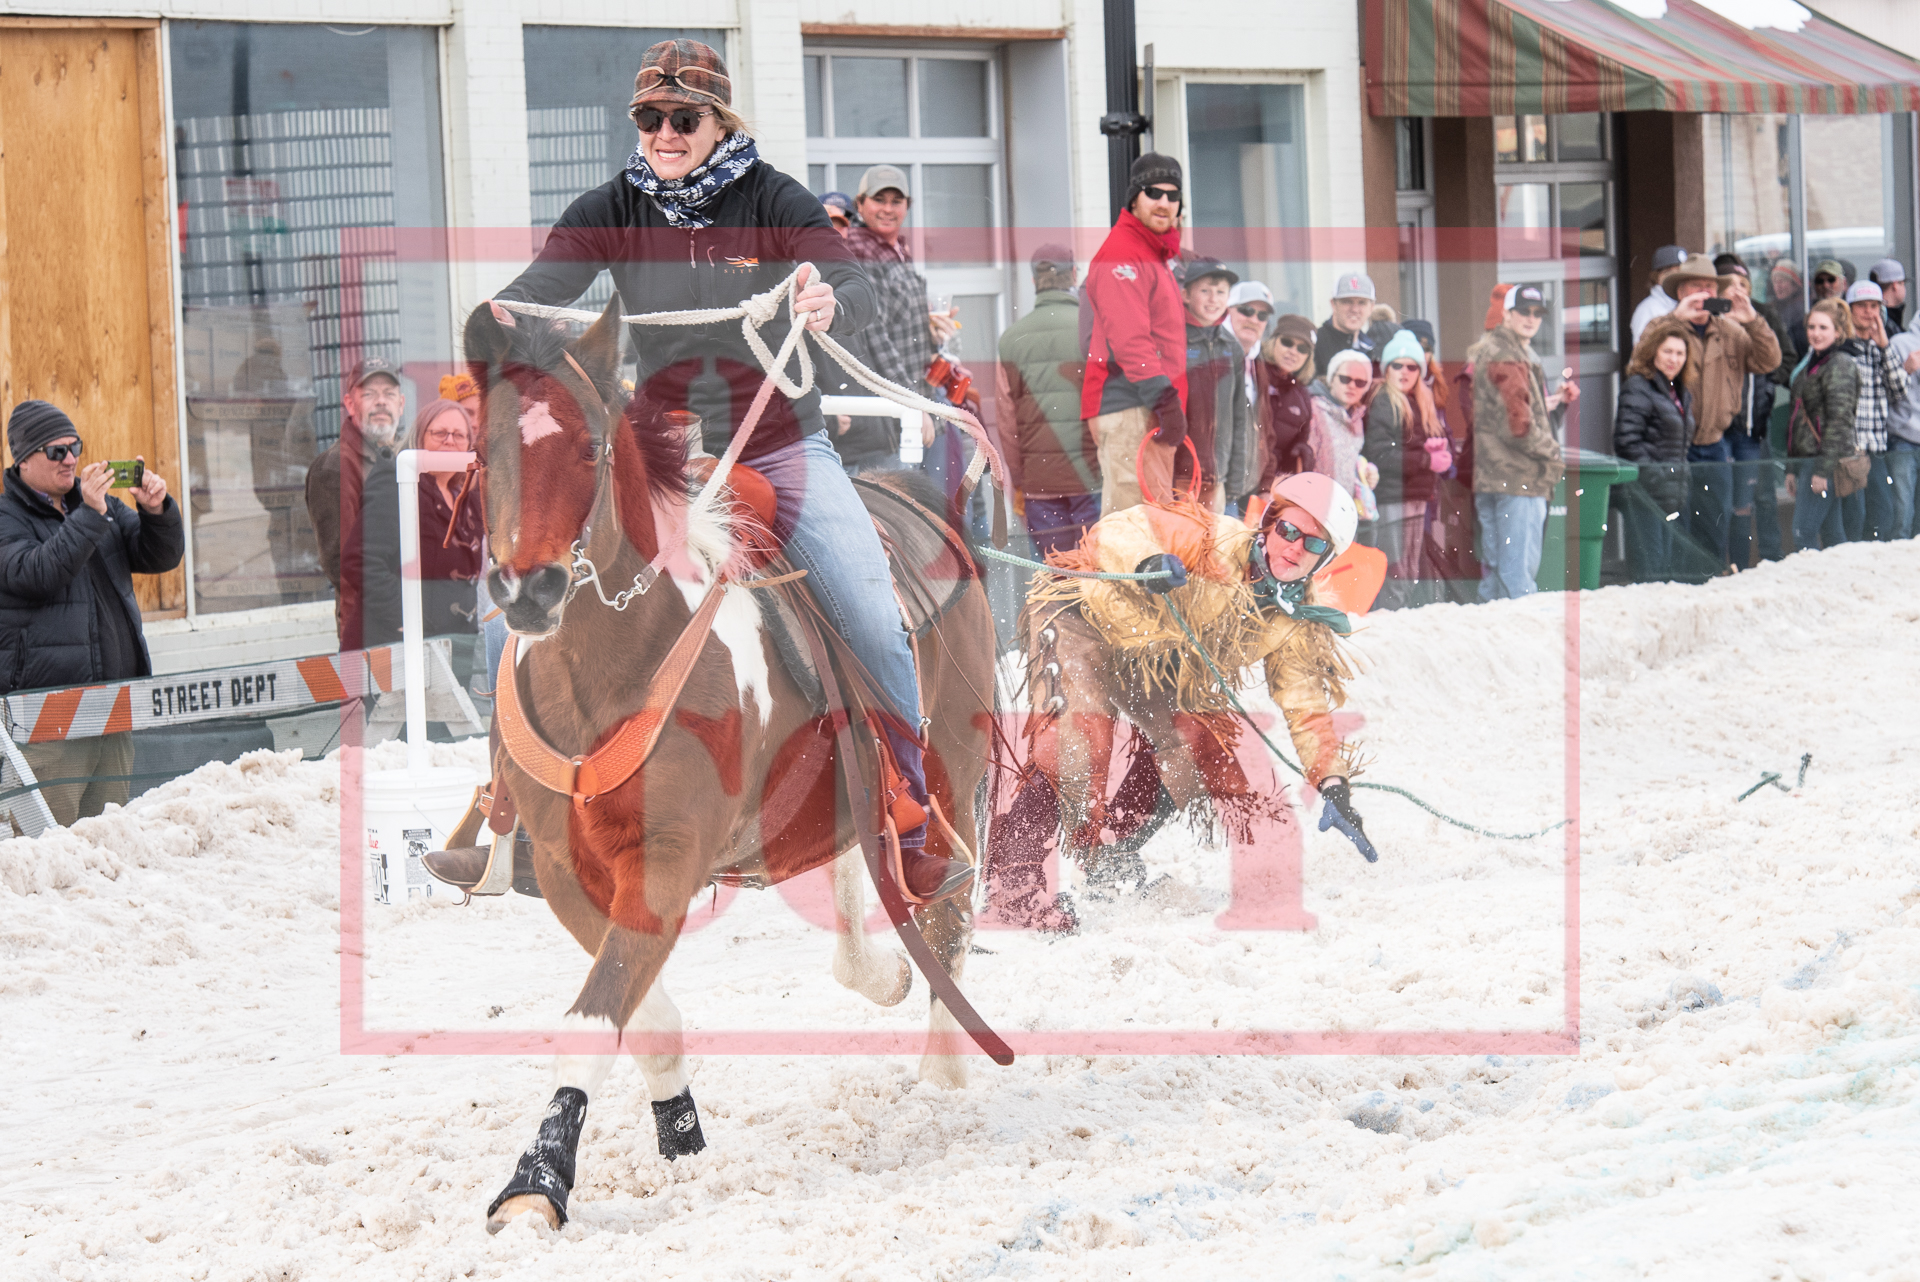 - Amanda Sandau - Snowboard 2